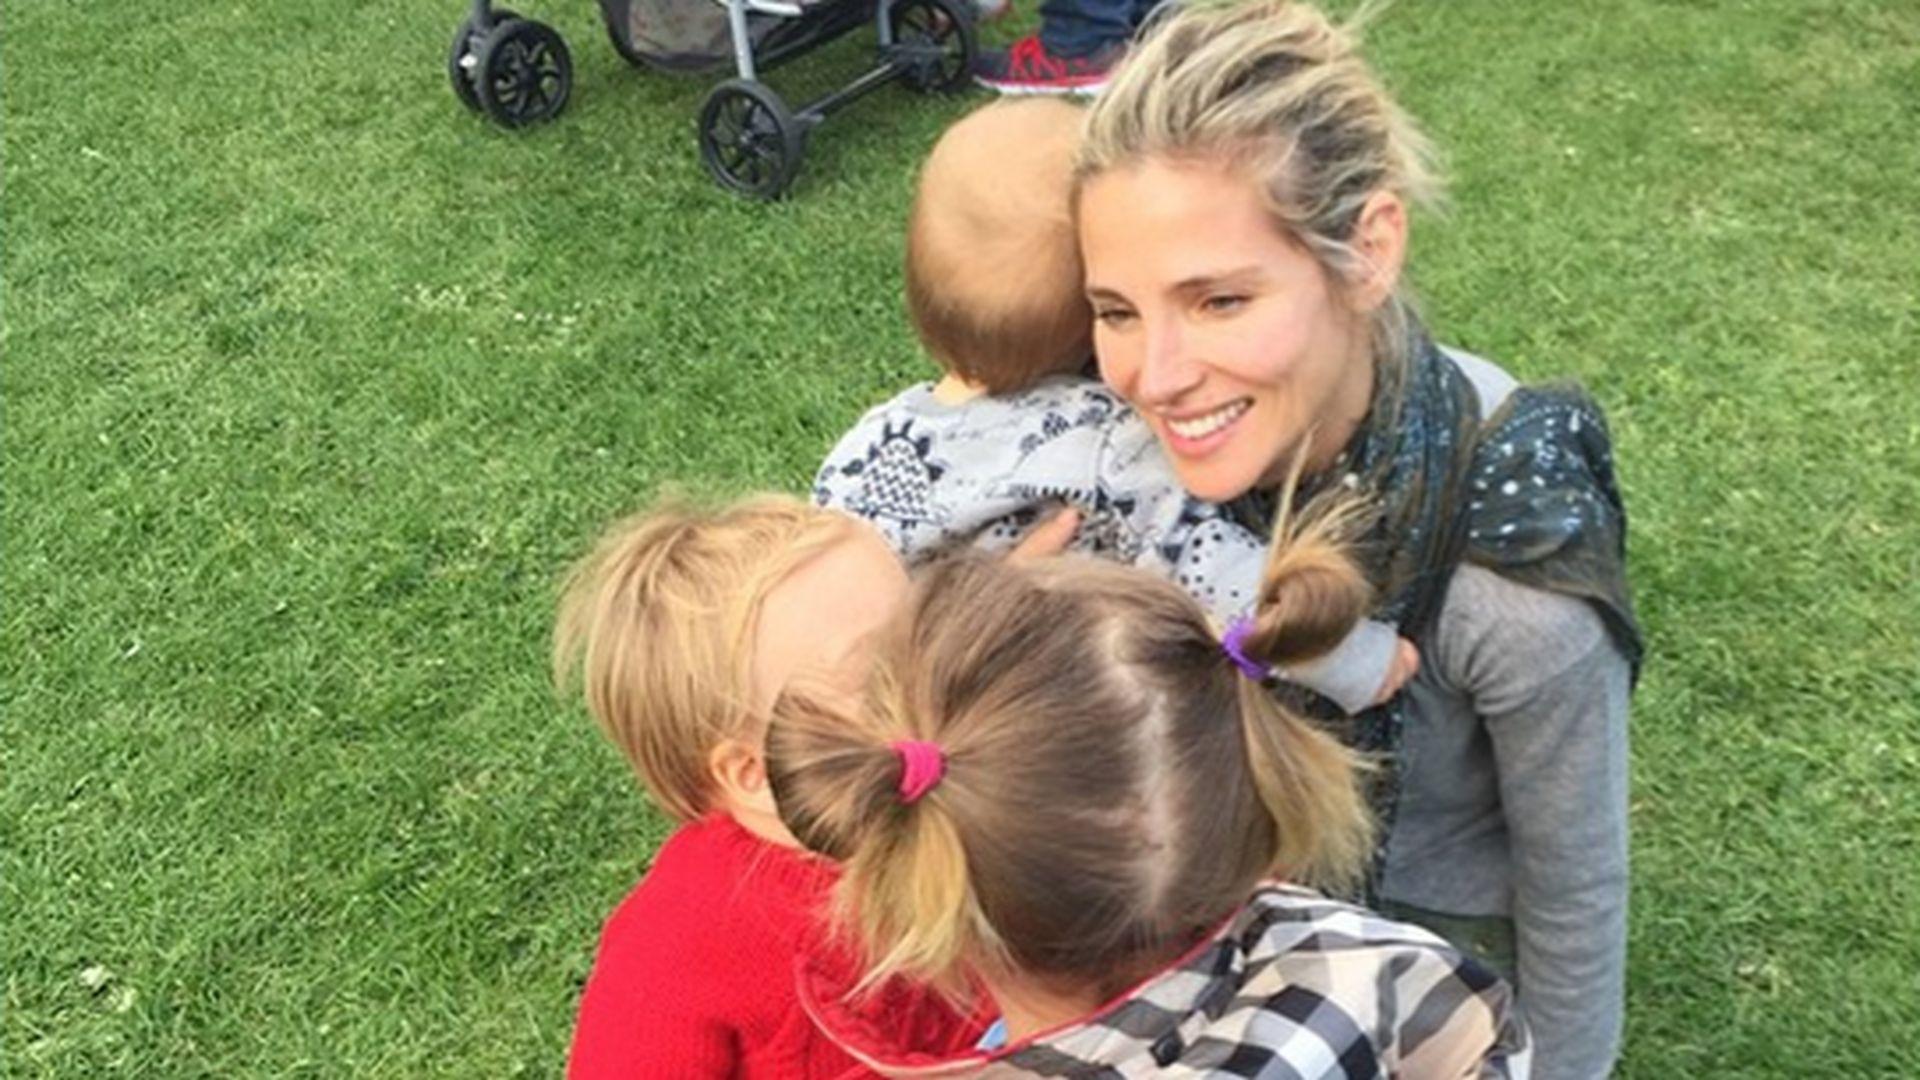 Coole Vollblut Mama Elsa Pataky hat ihre Kids voll im Griff